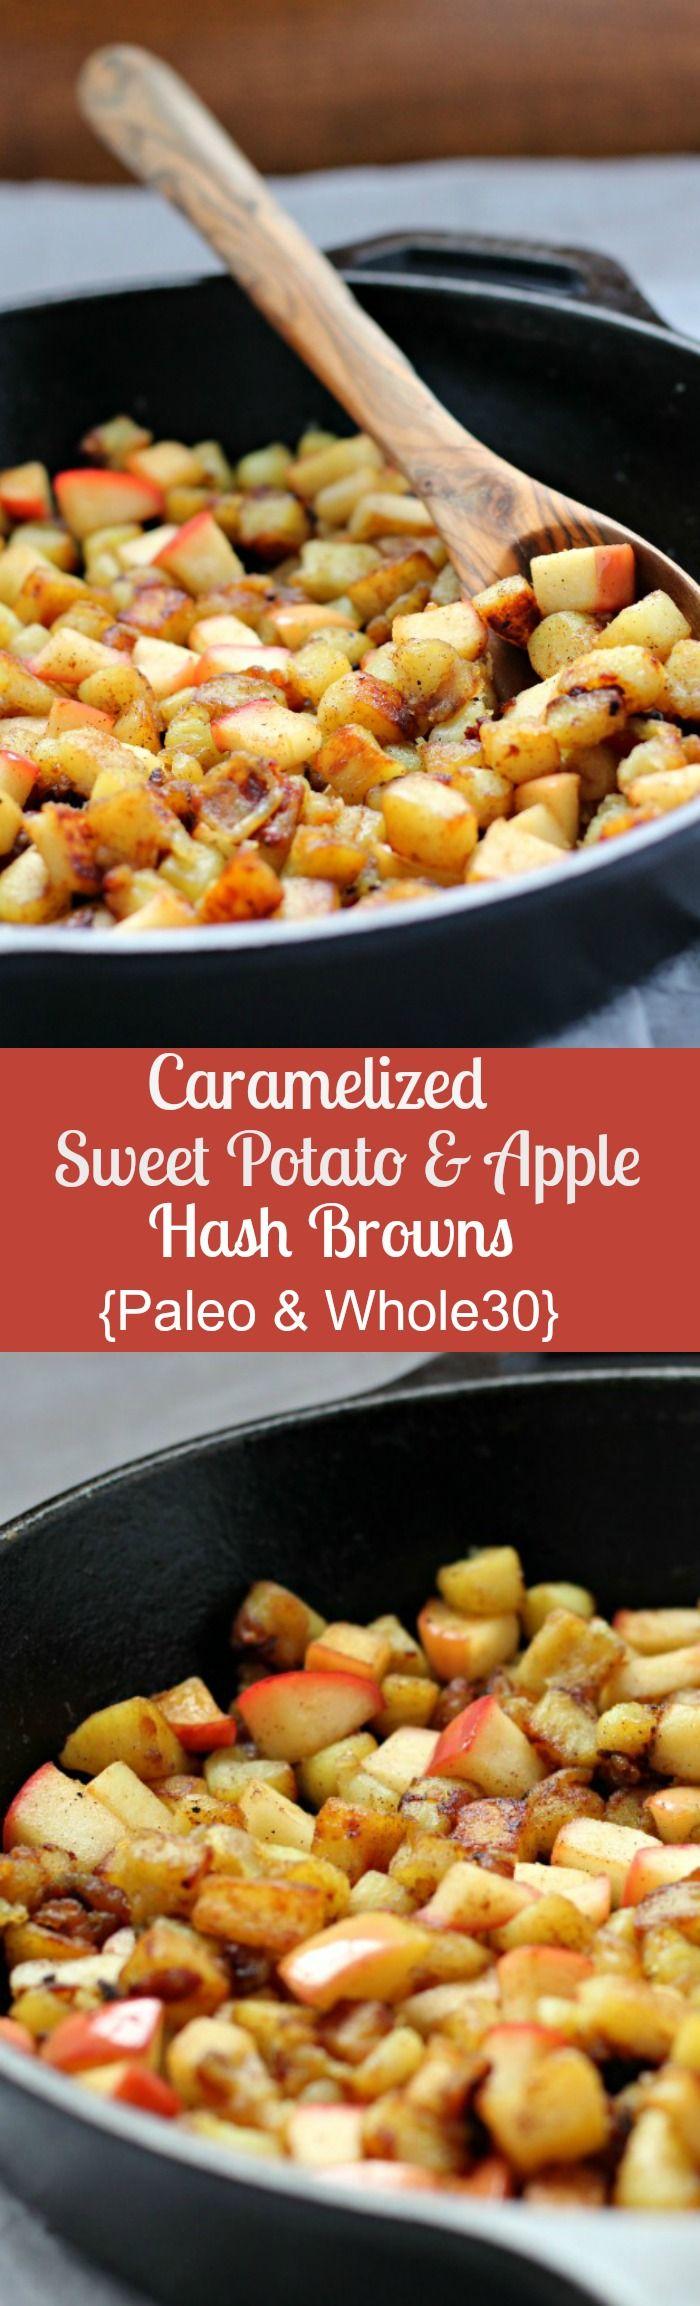 Caramelized Sweet Potato Apple Hash Browns